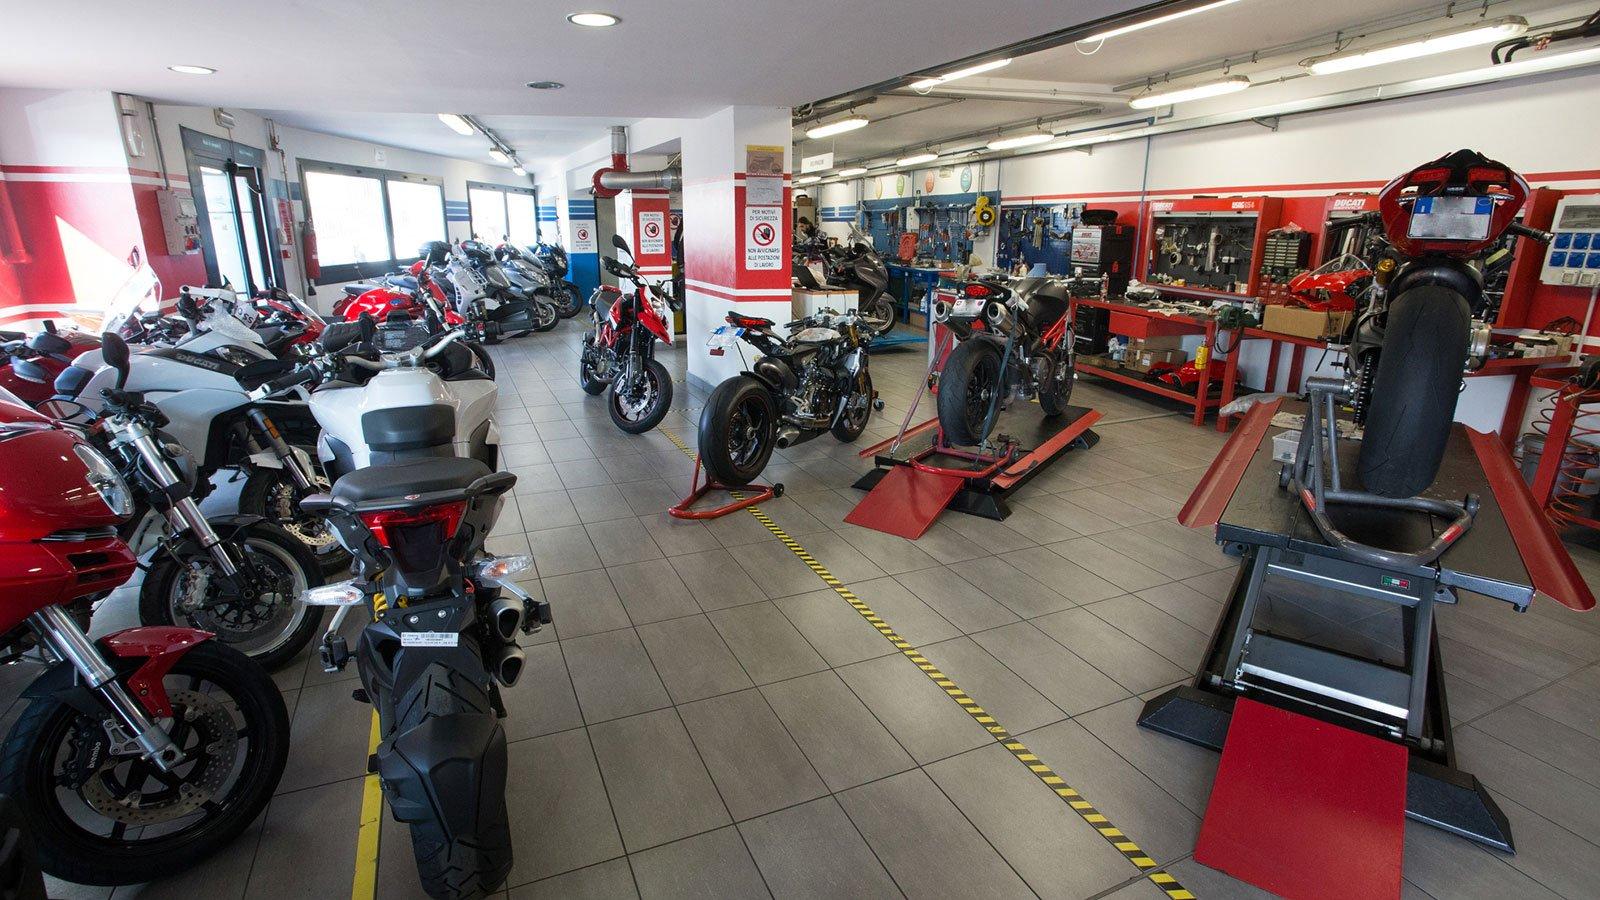 una serie di moto Ducati parcheggiate in un officina